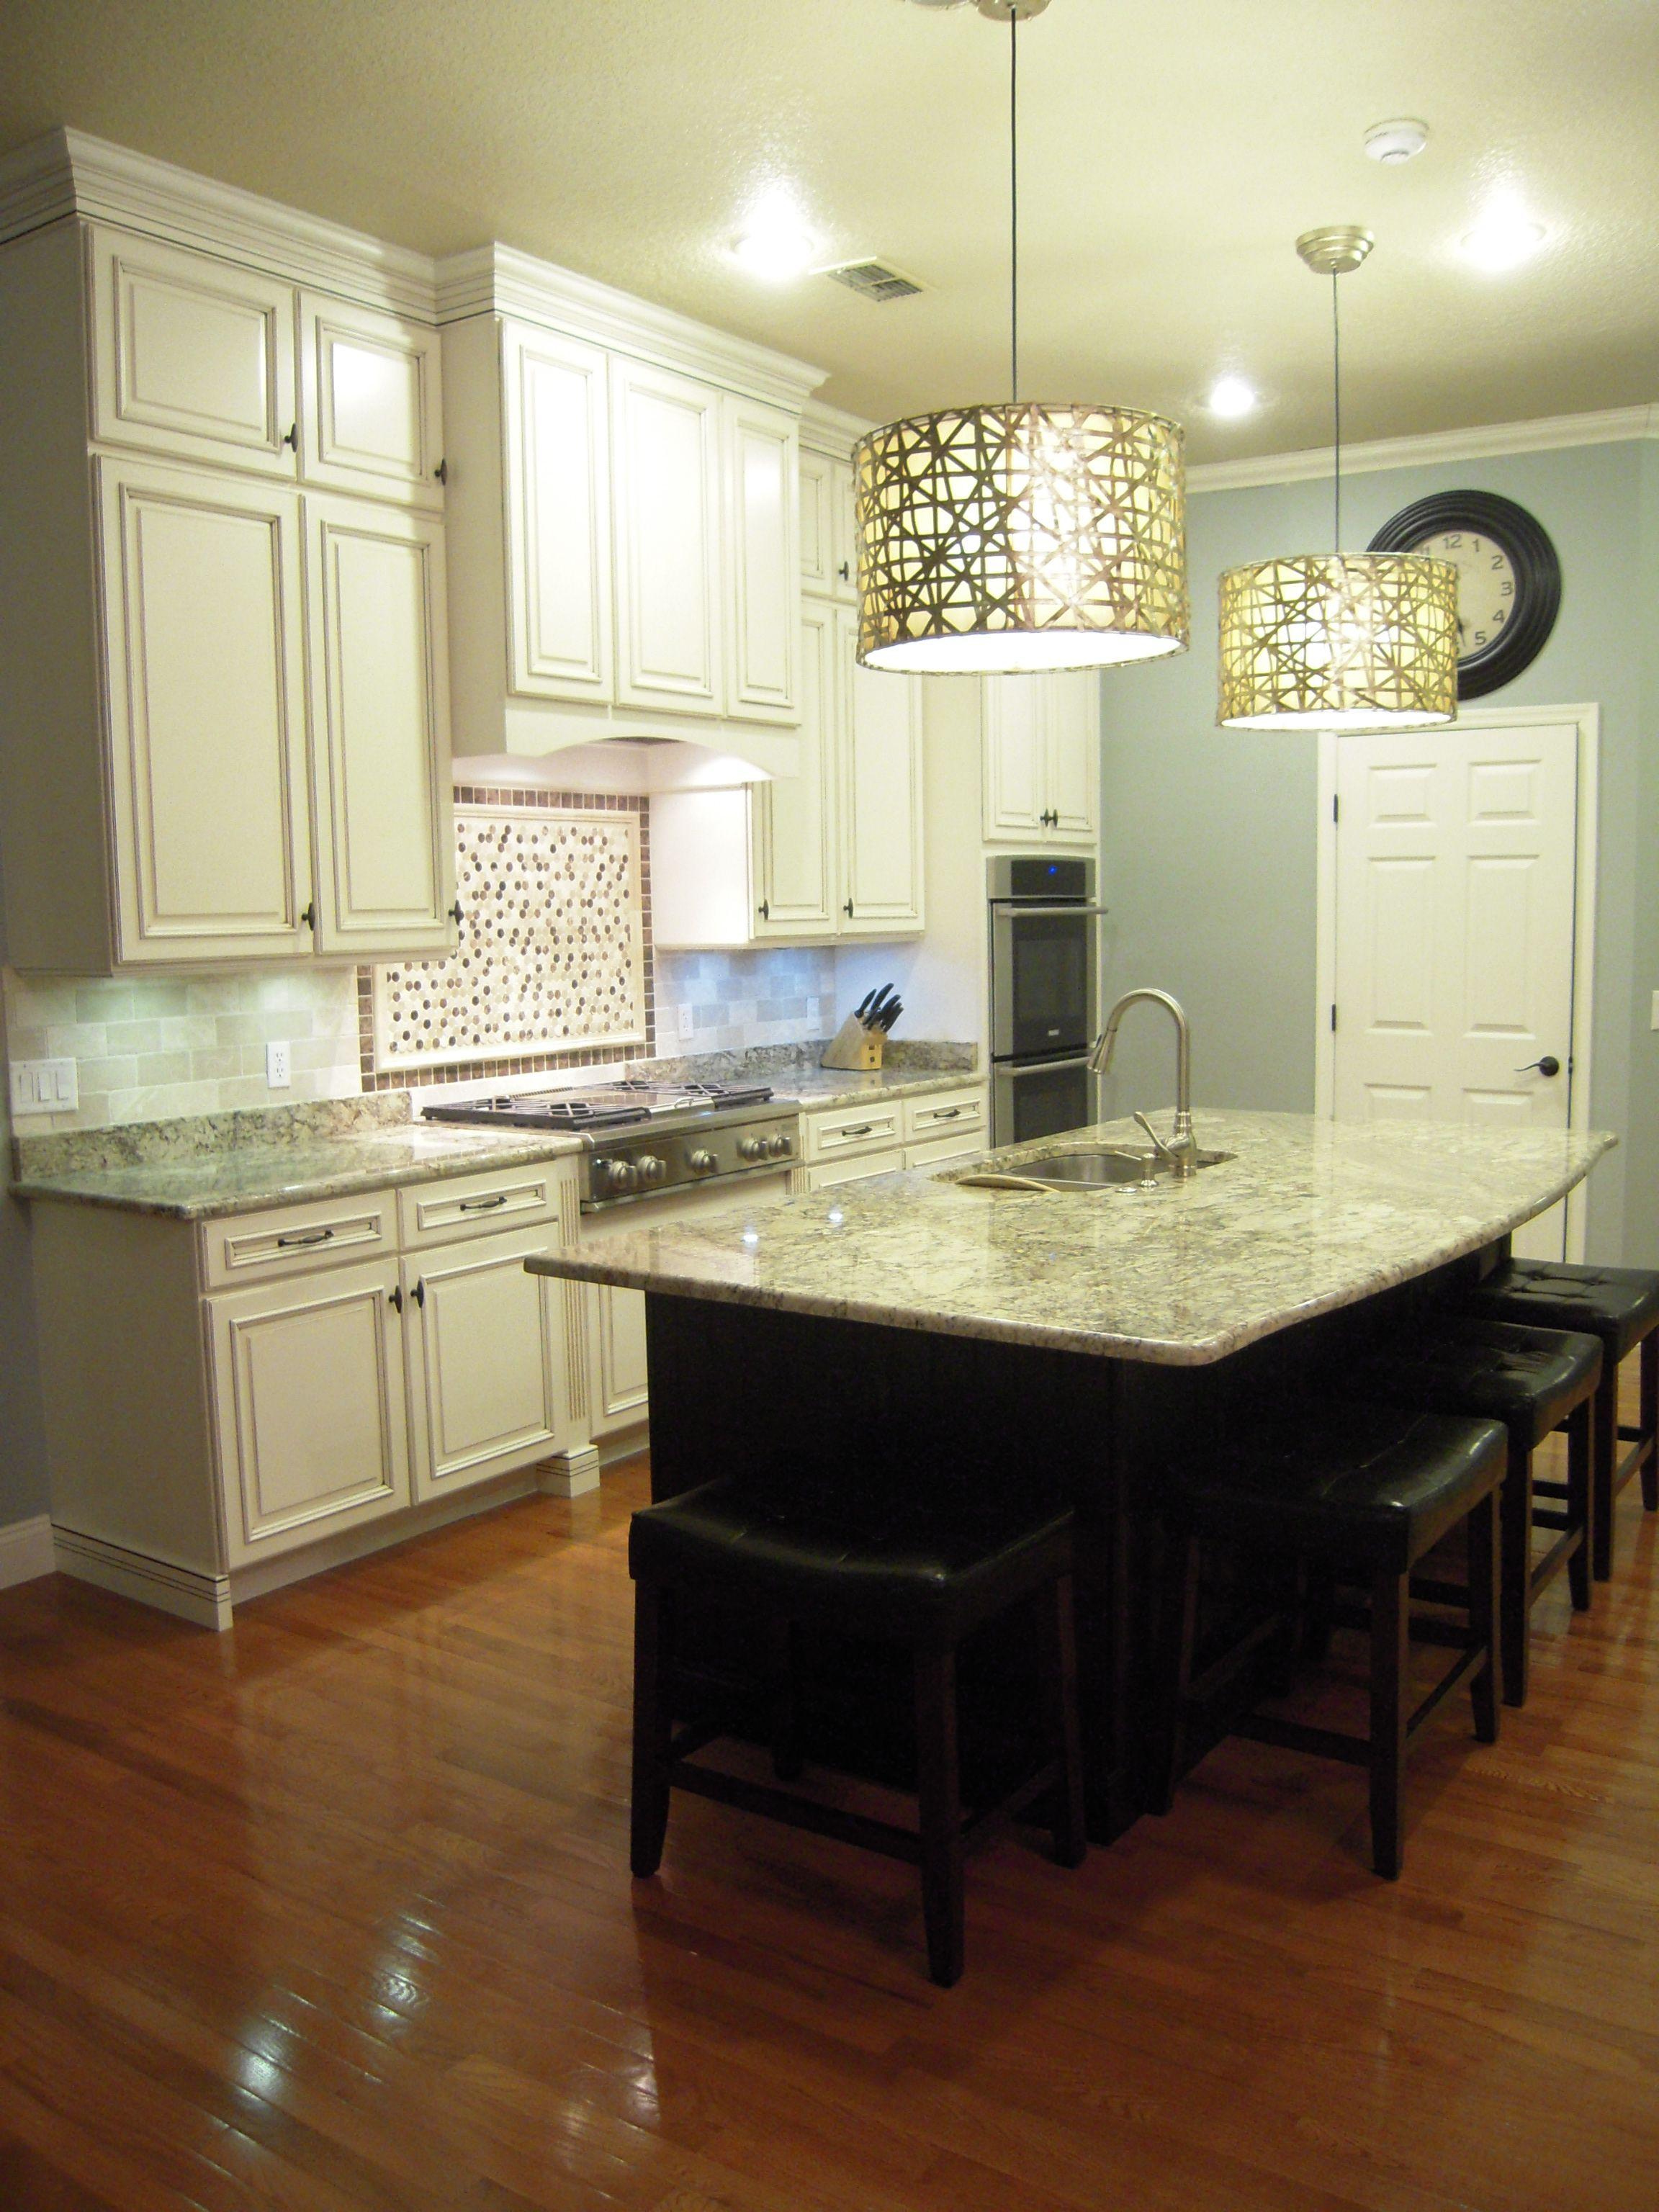 Good Orlando Exhibitor Spotlight: Stevens Kitchens